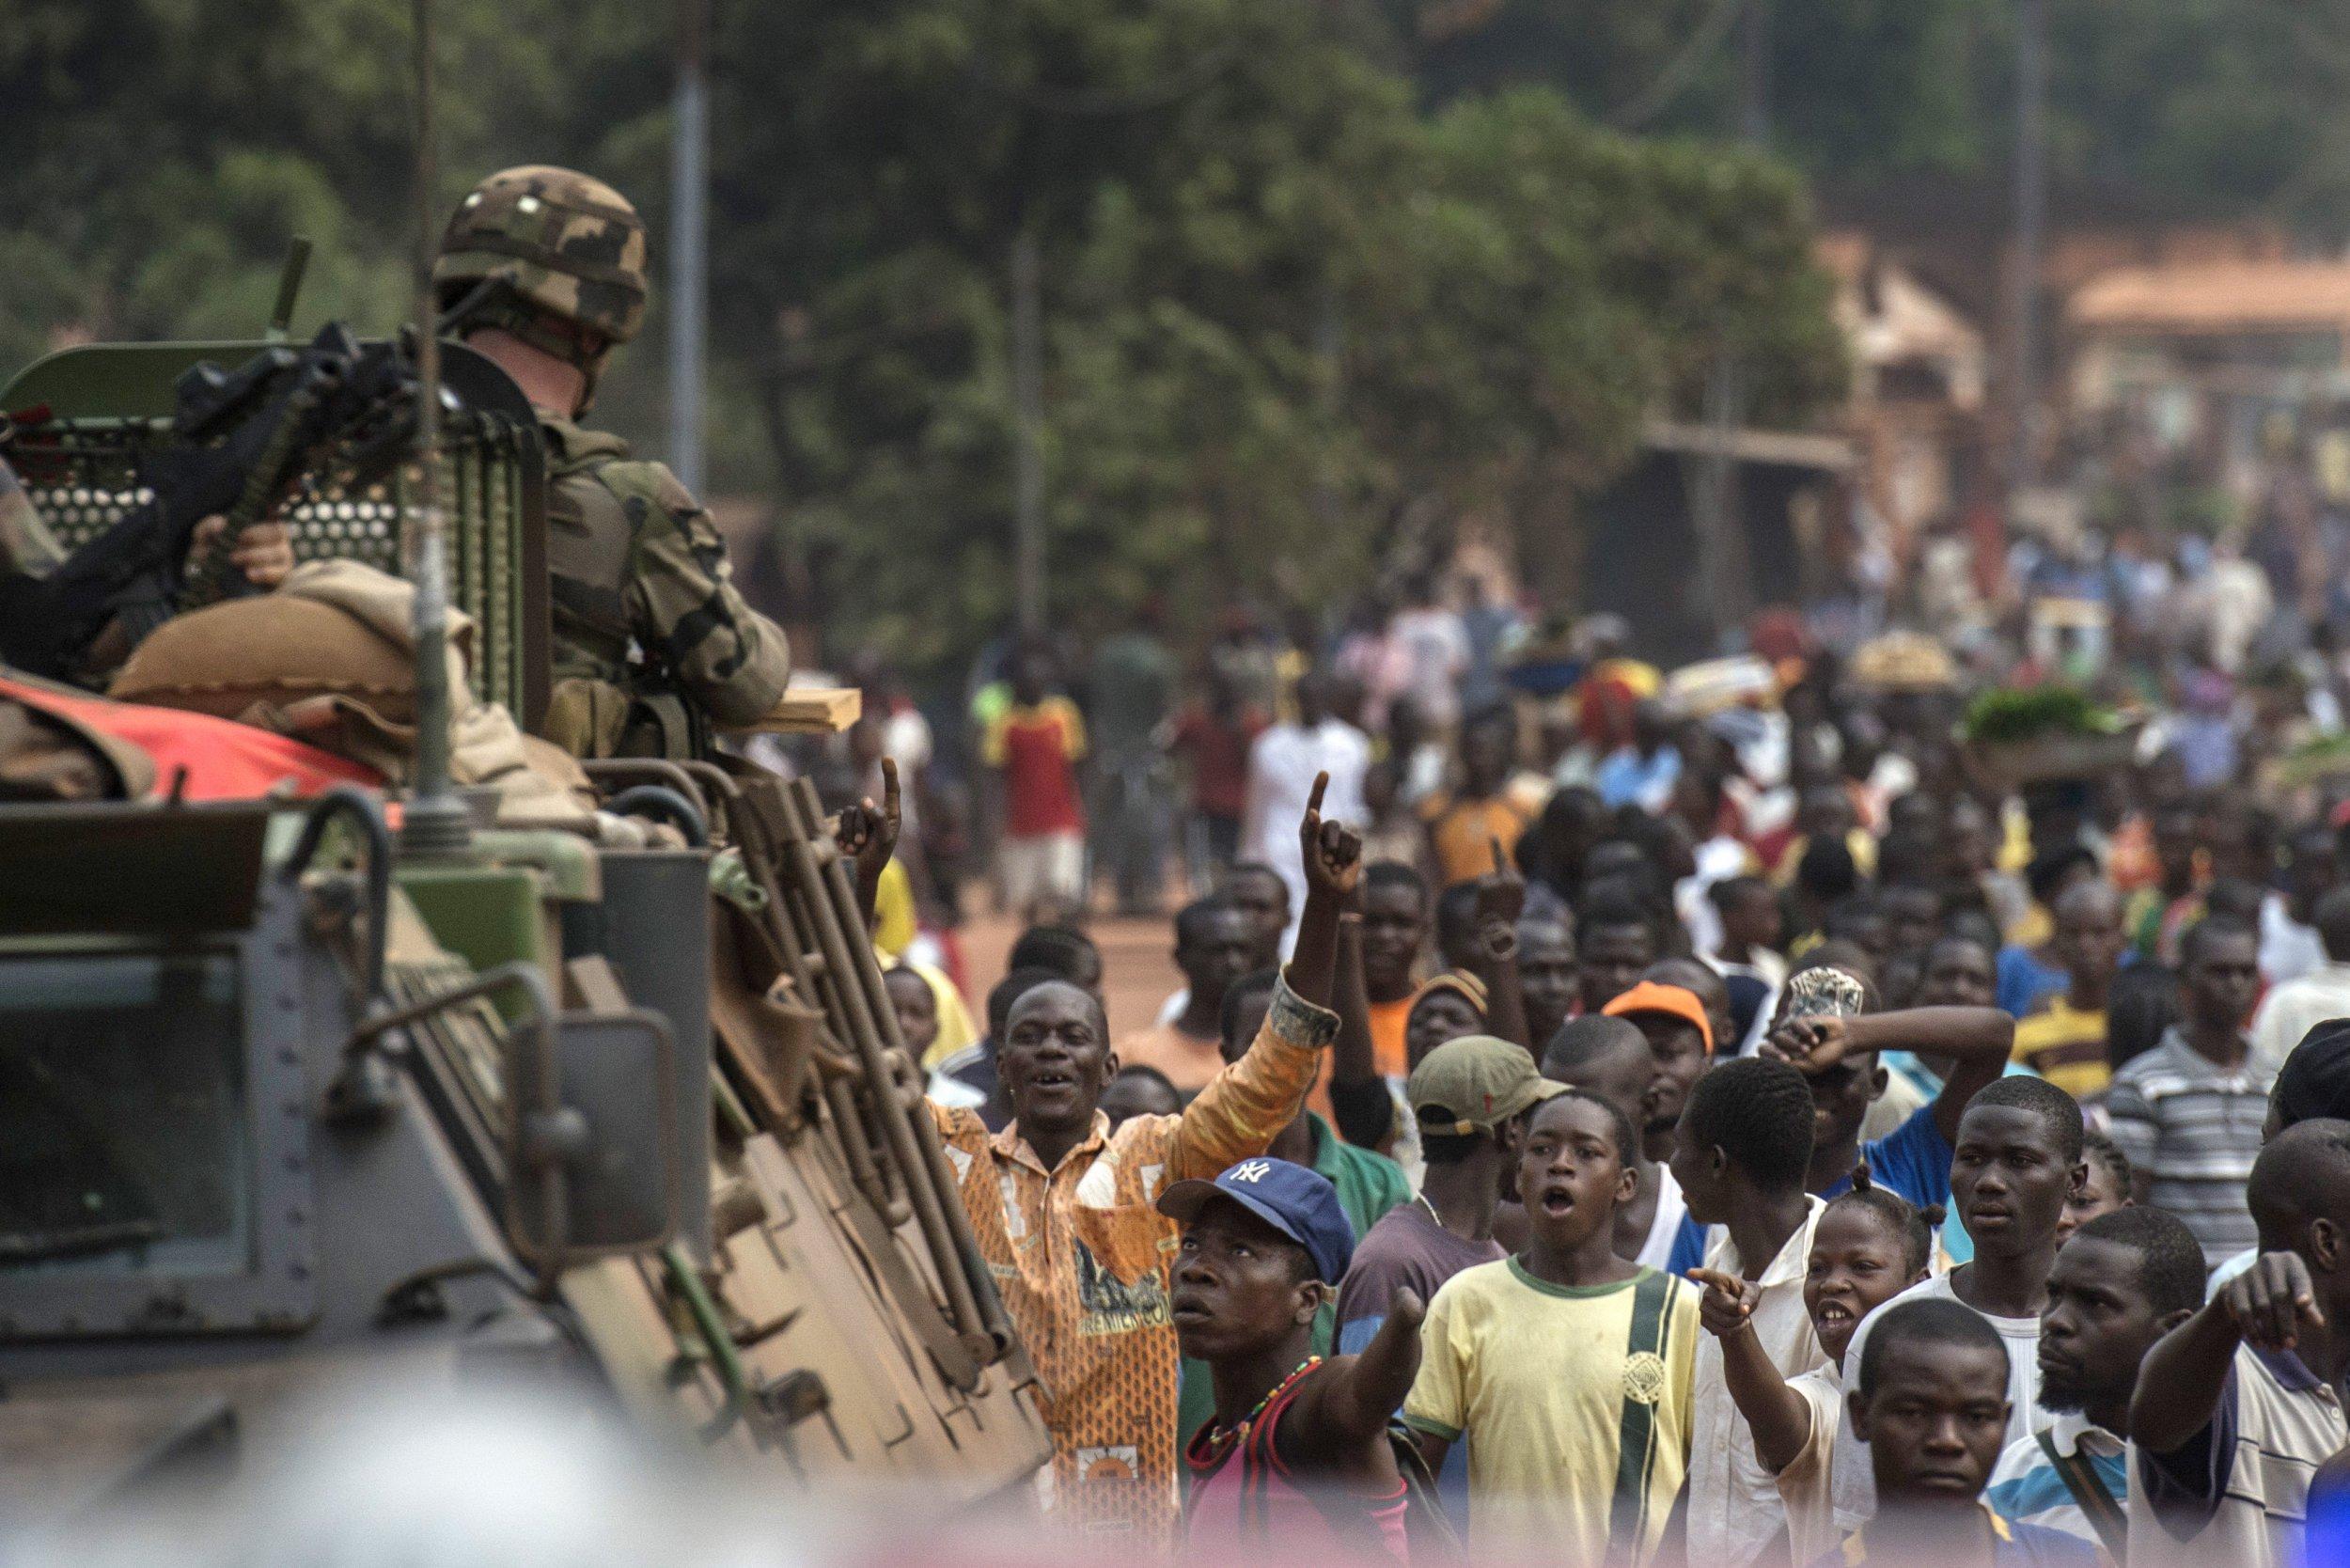 Central African Republic patrol